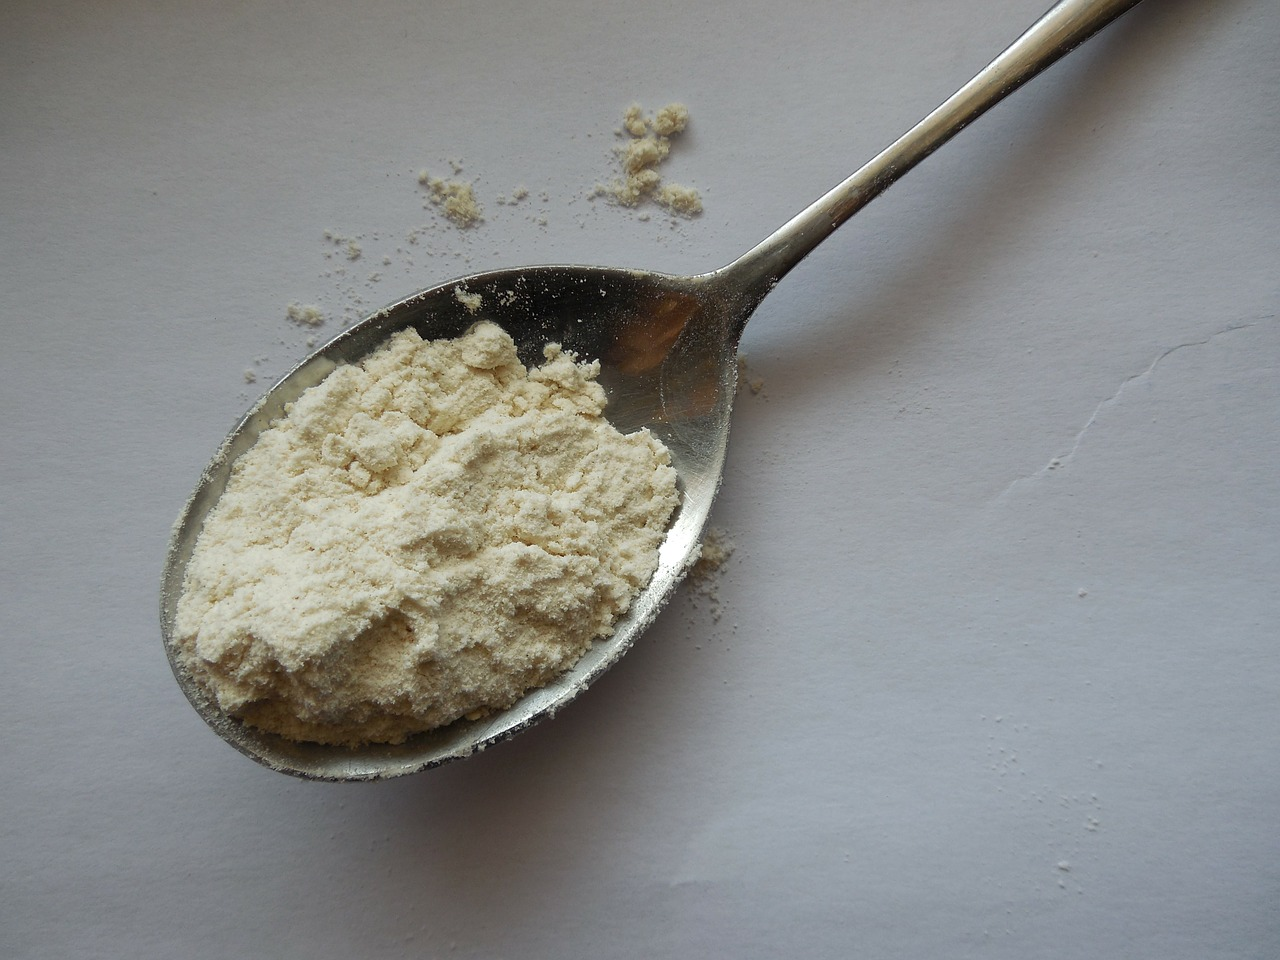 La farine de coco et de lupin